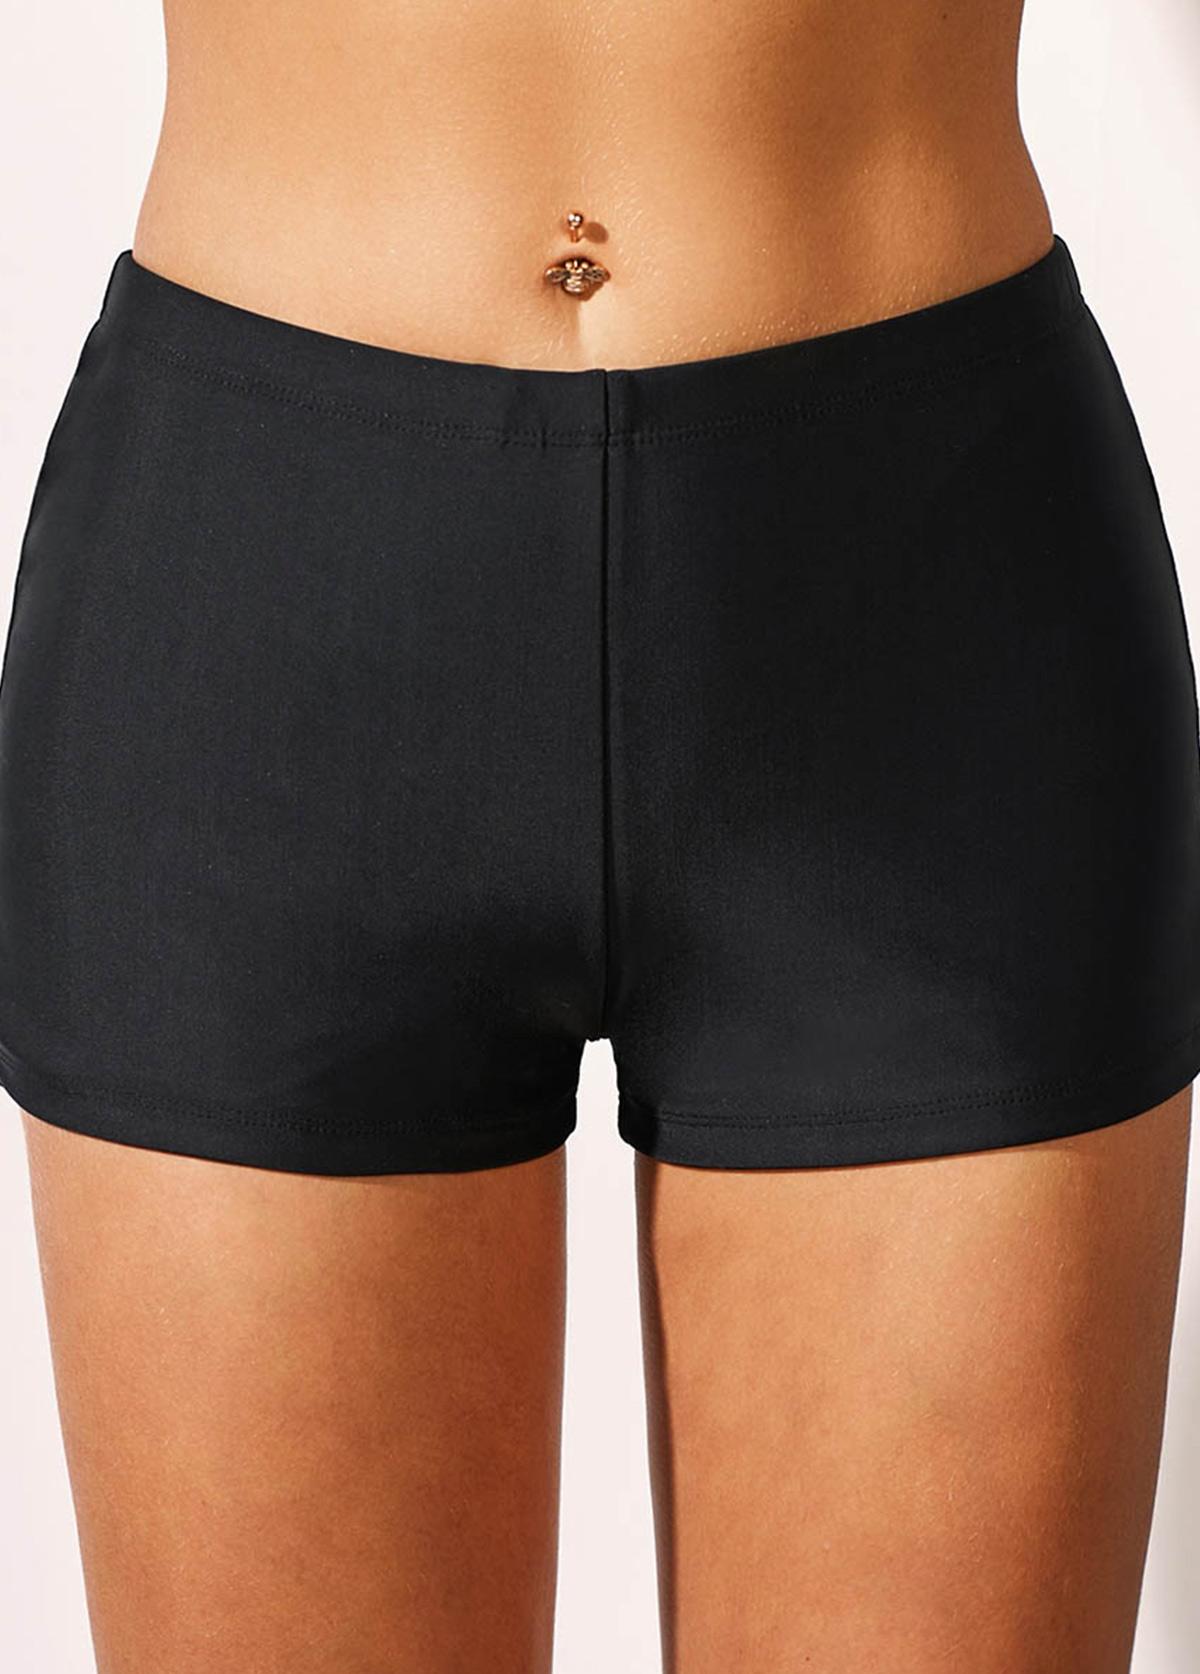 Basic Black Mid Waist Swimwear Shorts